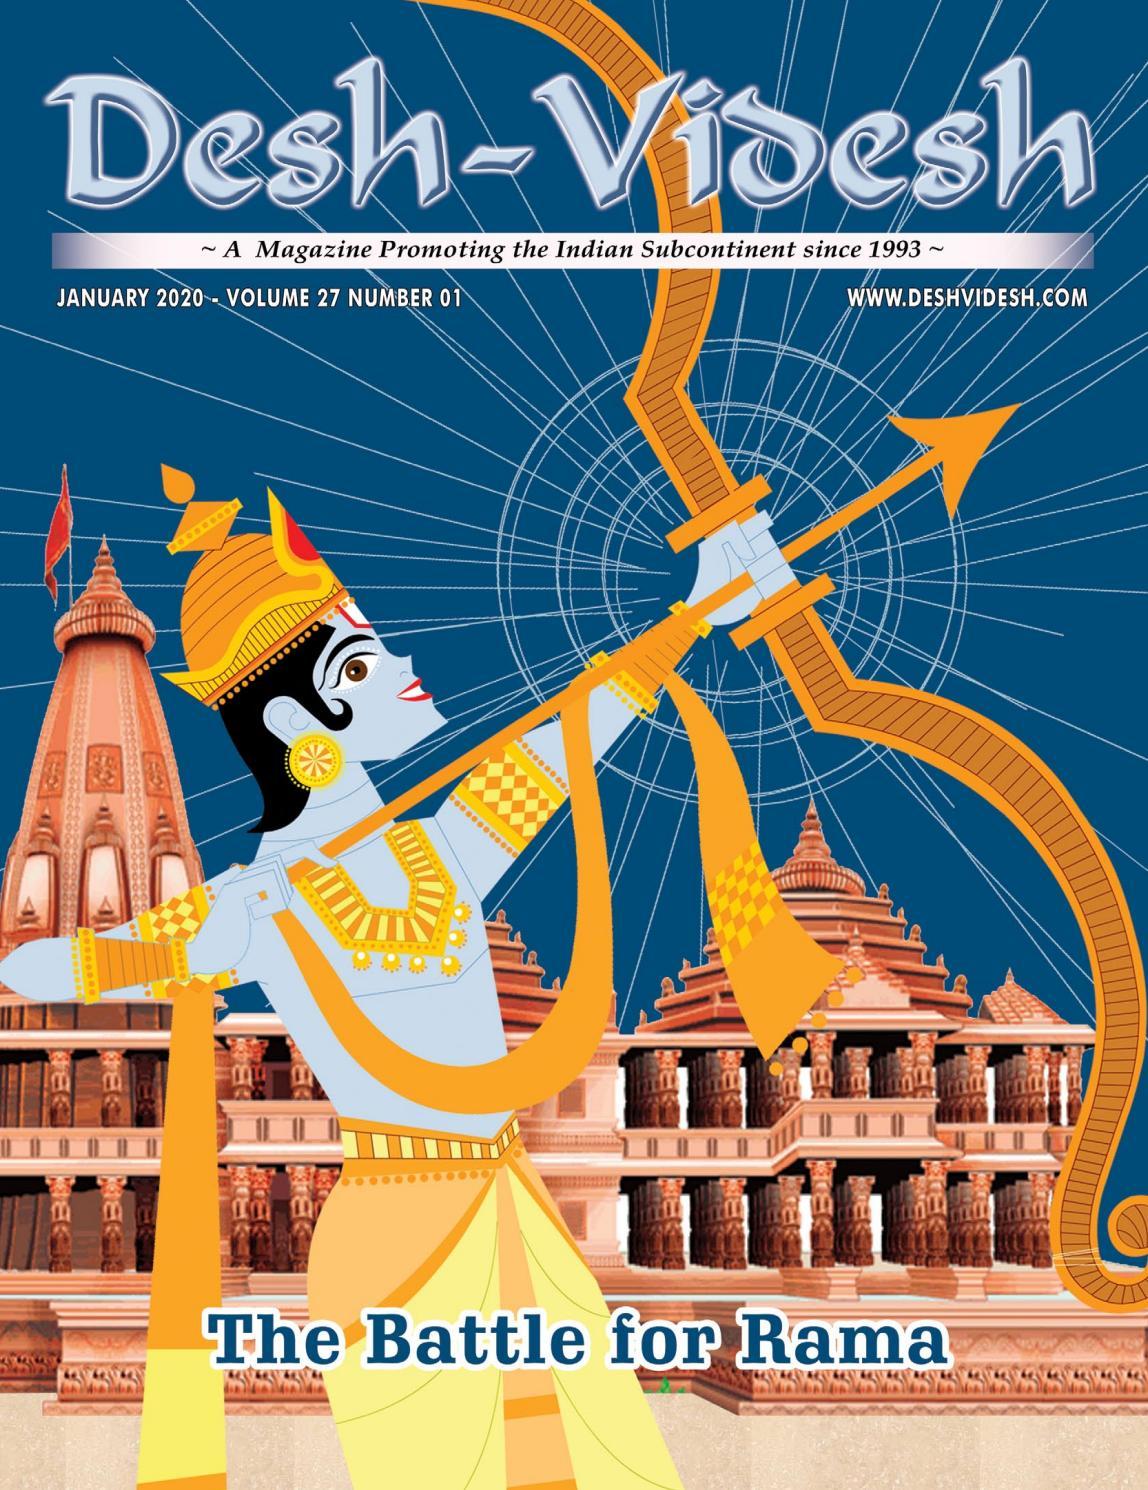 Desh Videsh Magazine Finance Edition January 2020 By Desh Videsh Issuu